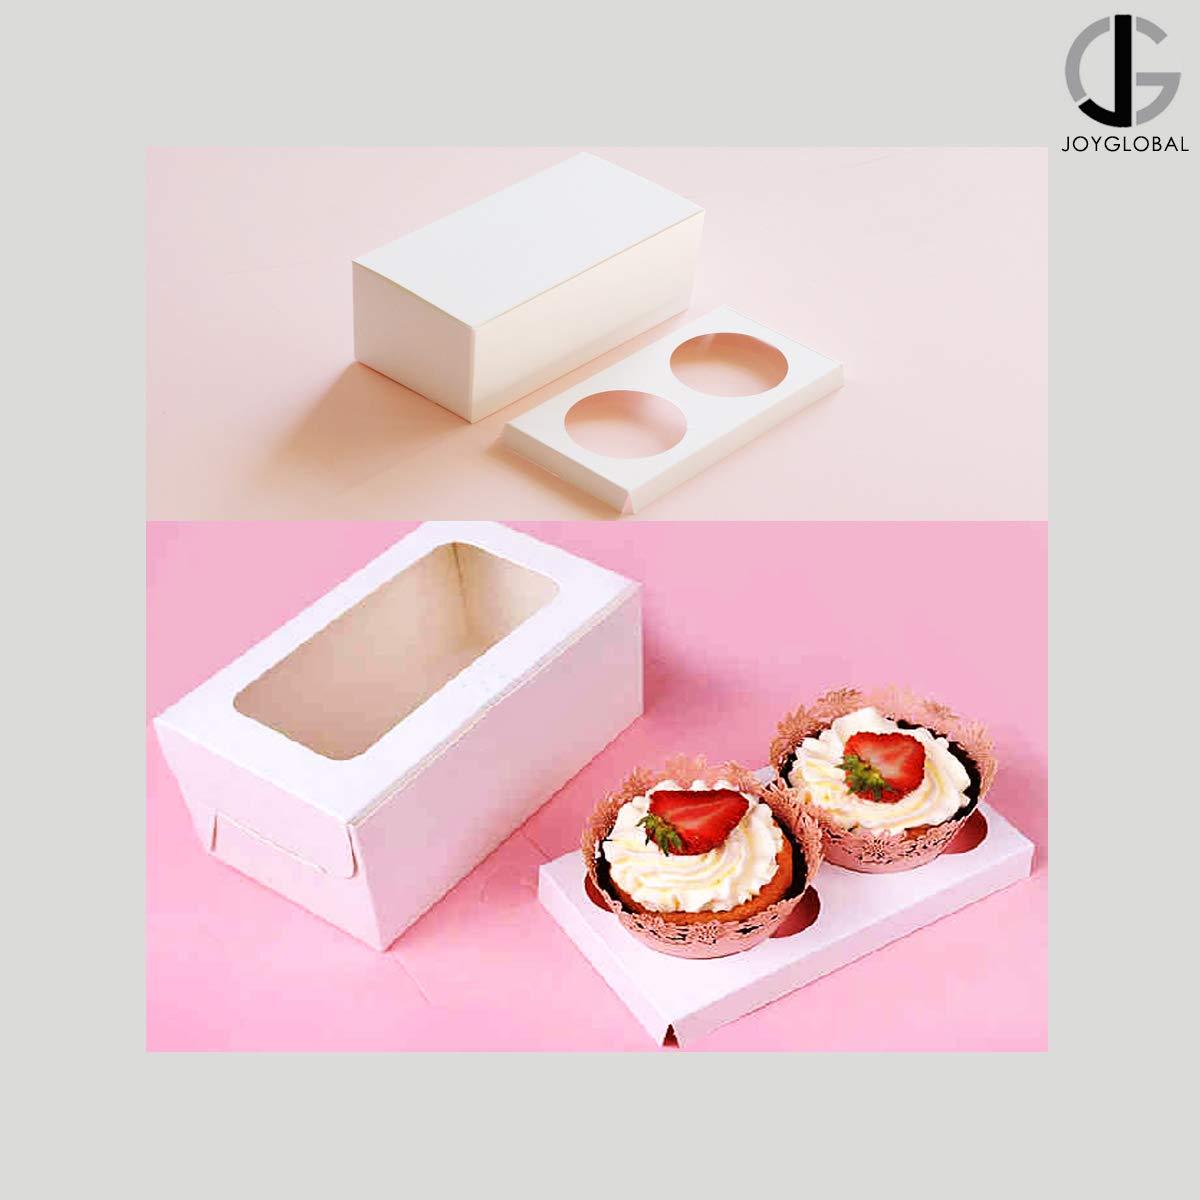 PINK 10 or more Premium Single Cupcake Boxes